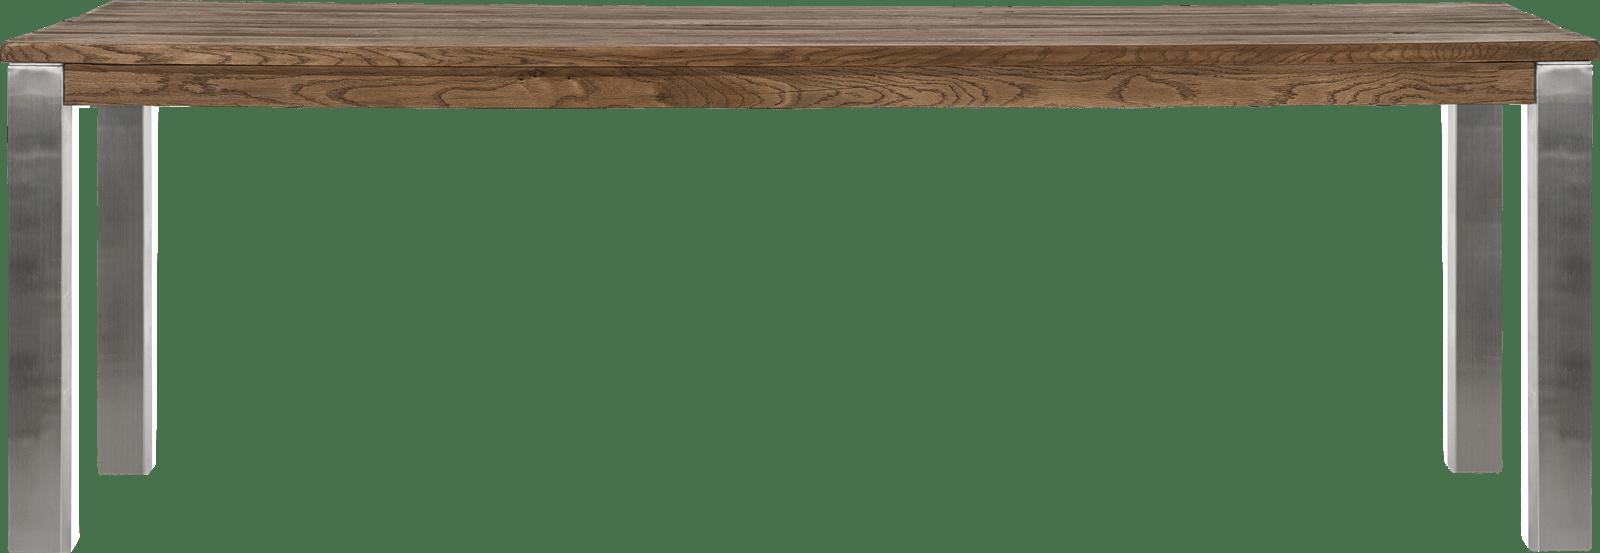 Masters - bartafel 240 x 100 cm - rvs 9x9